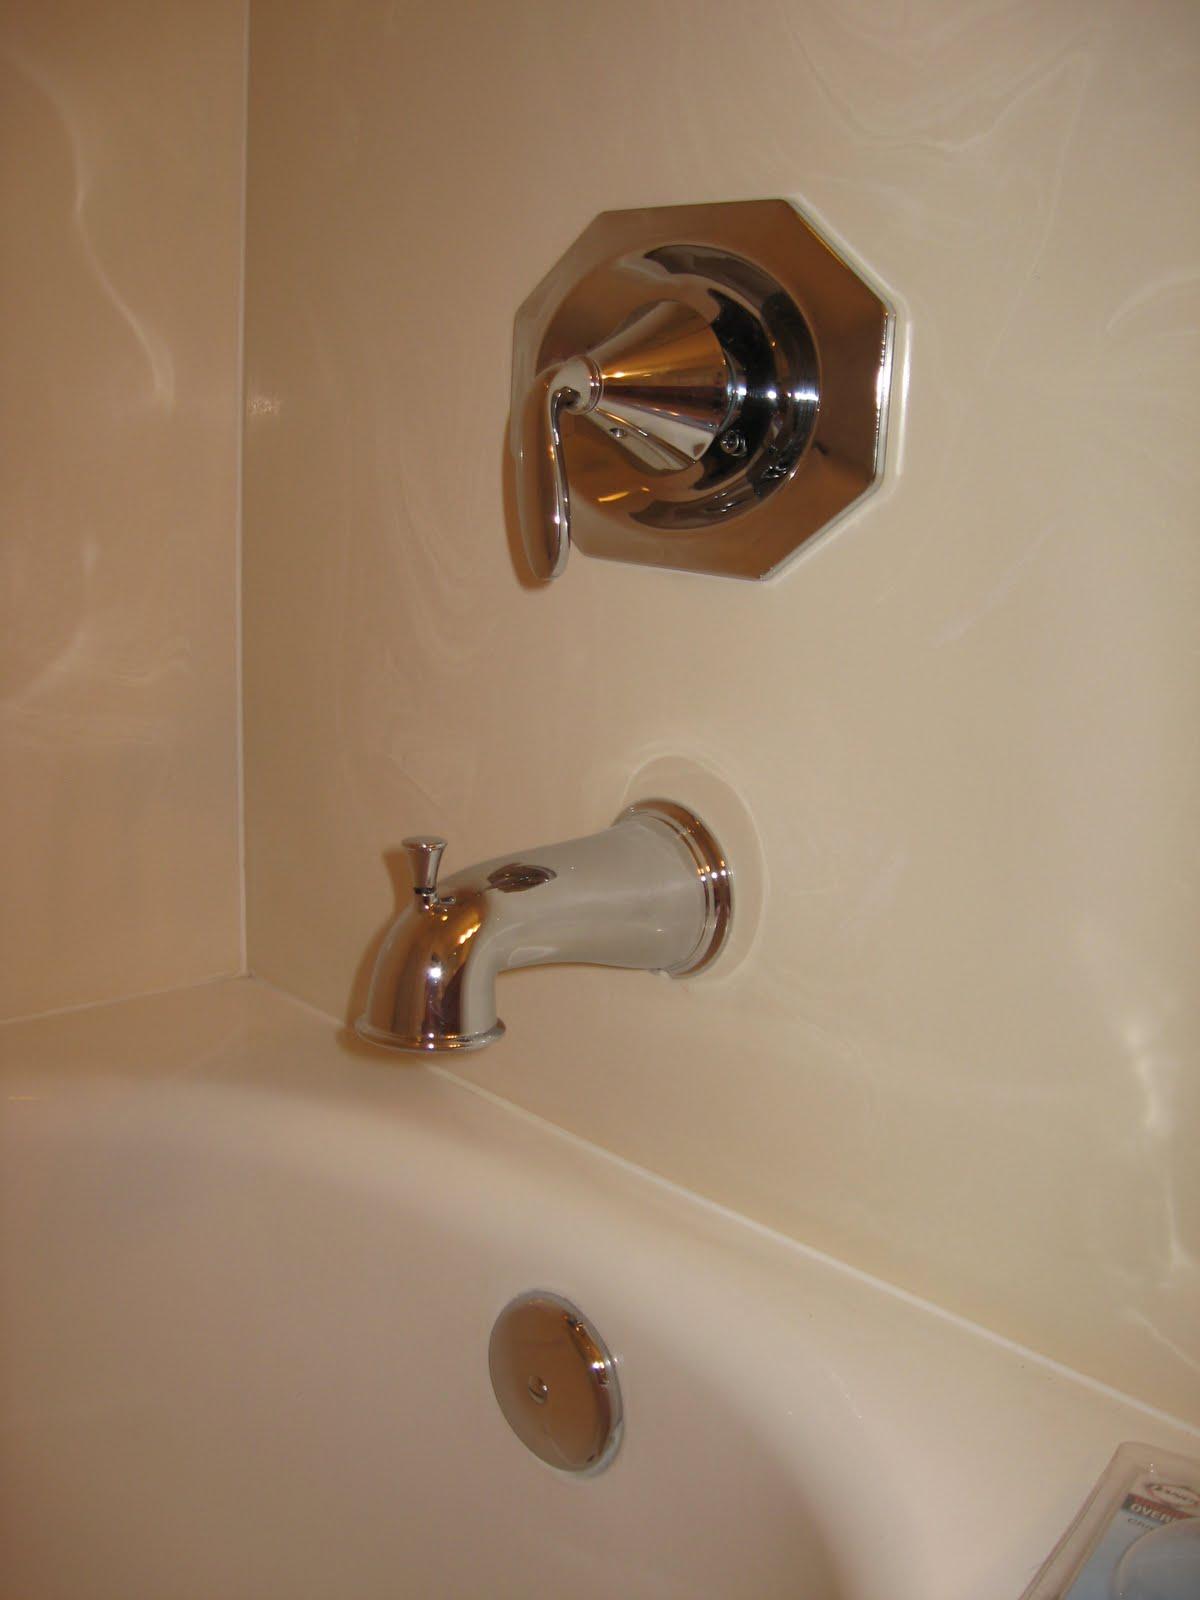 faucets sets adalbert shower sp bathtub faucet hardware freestanding w buy with shop fixtures sink online fa hand bathroom chrome